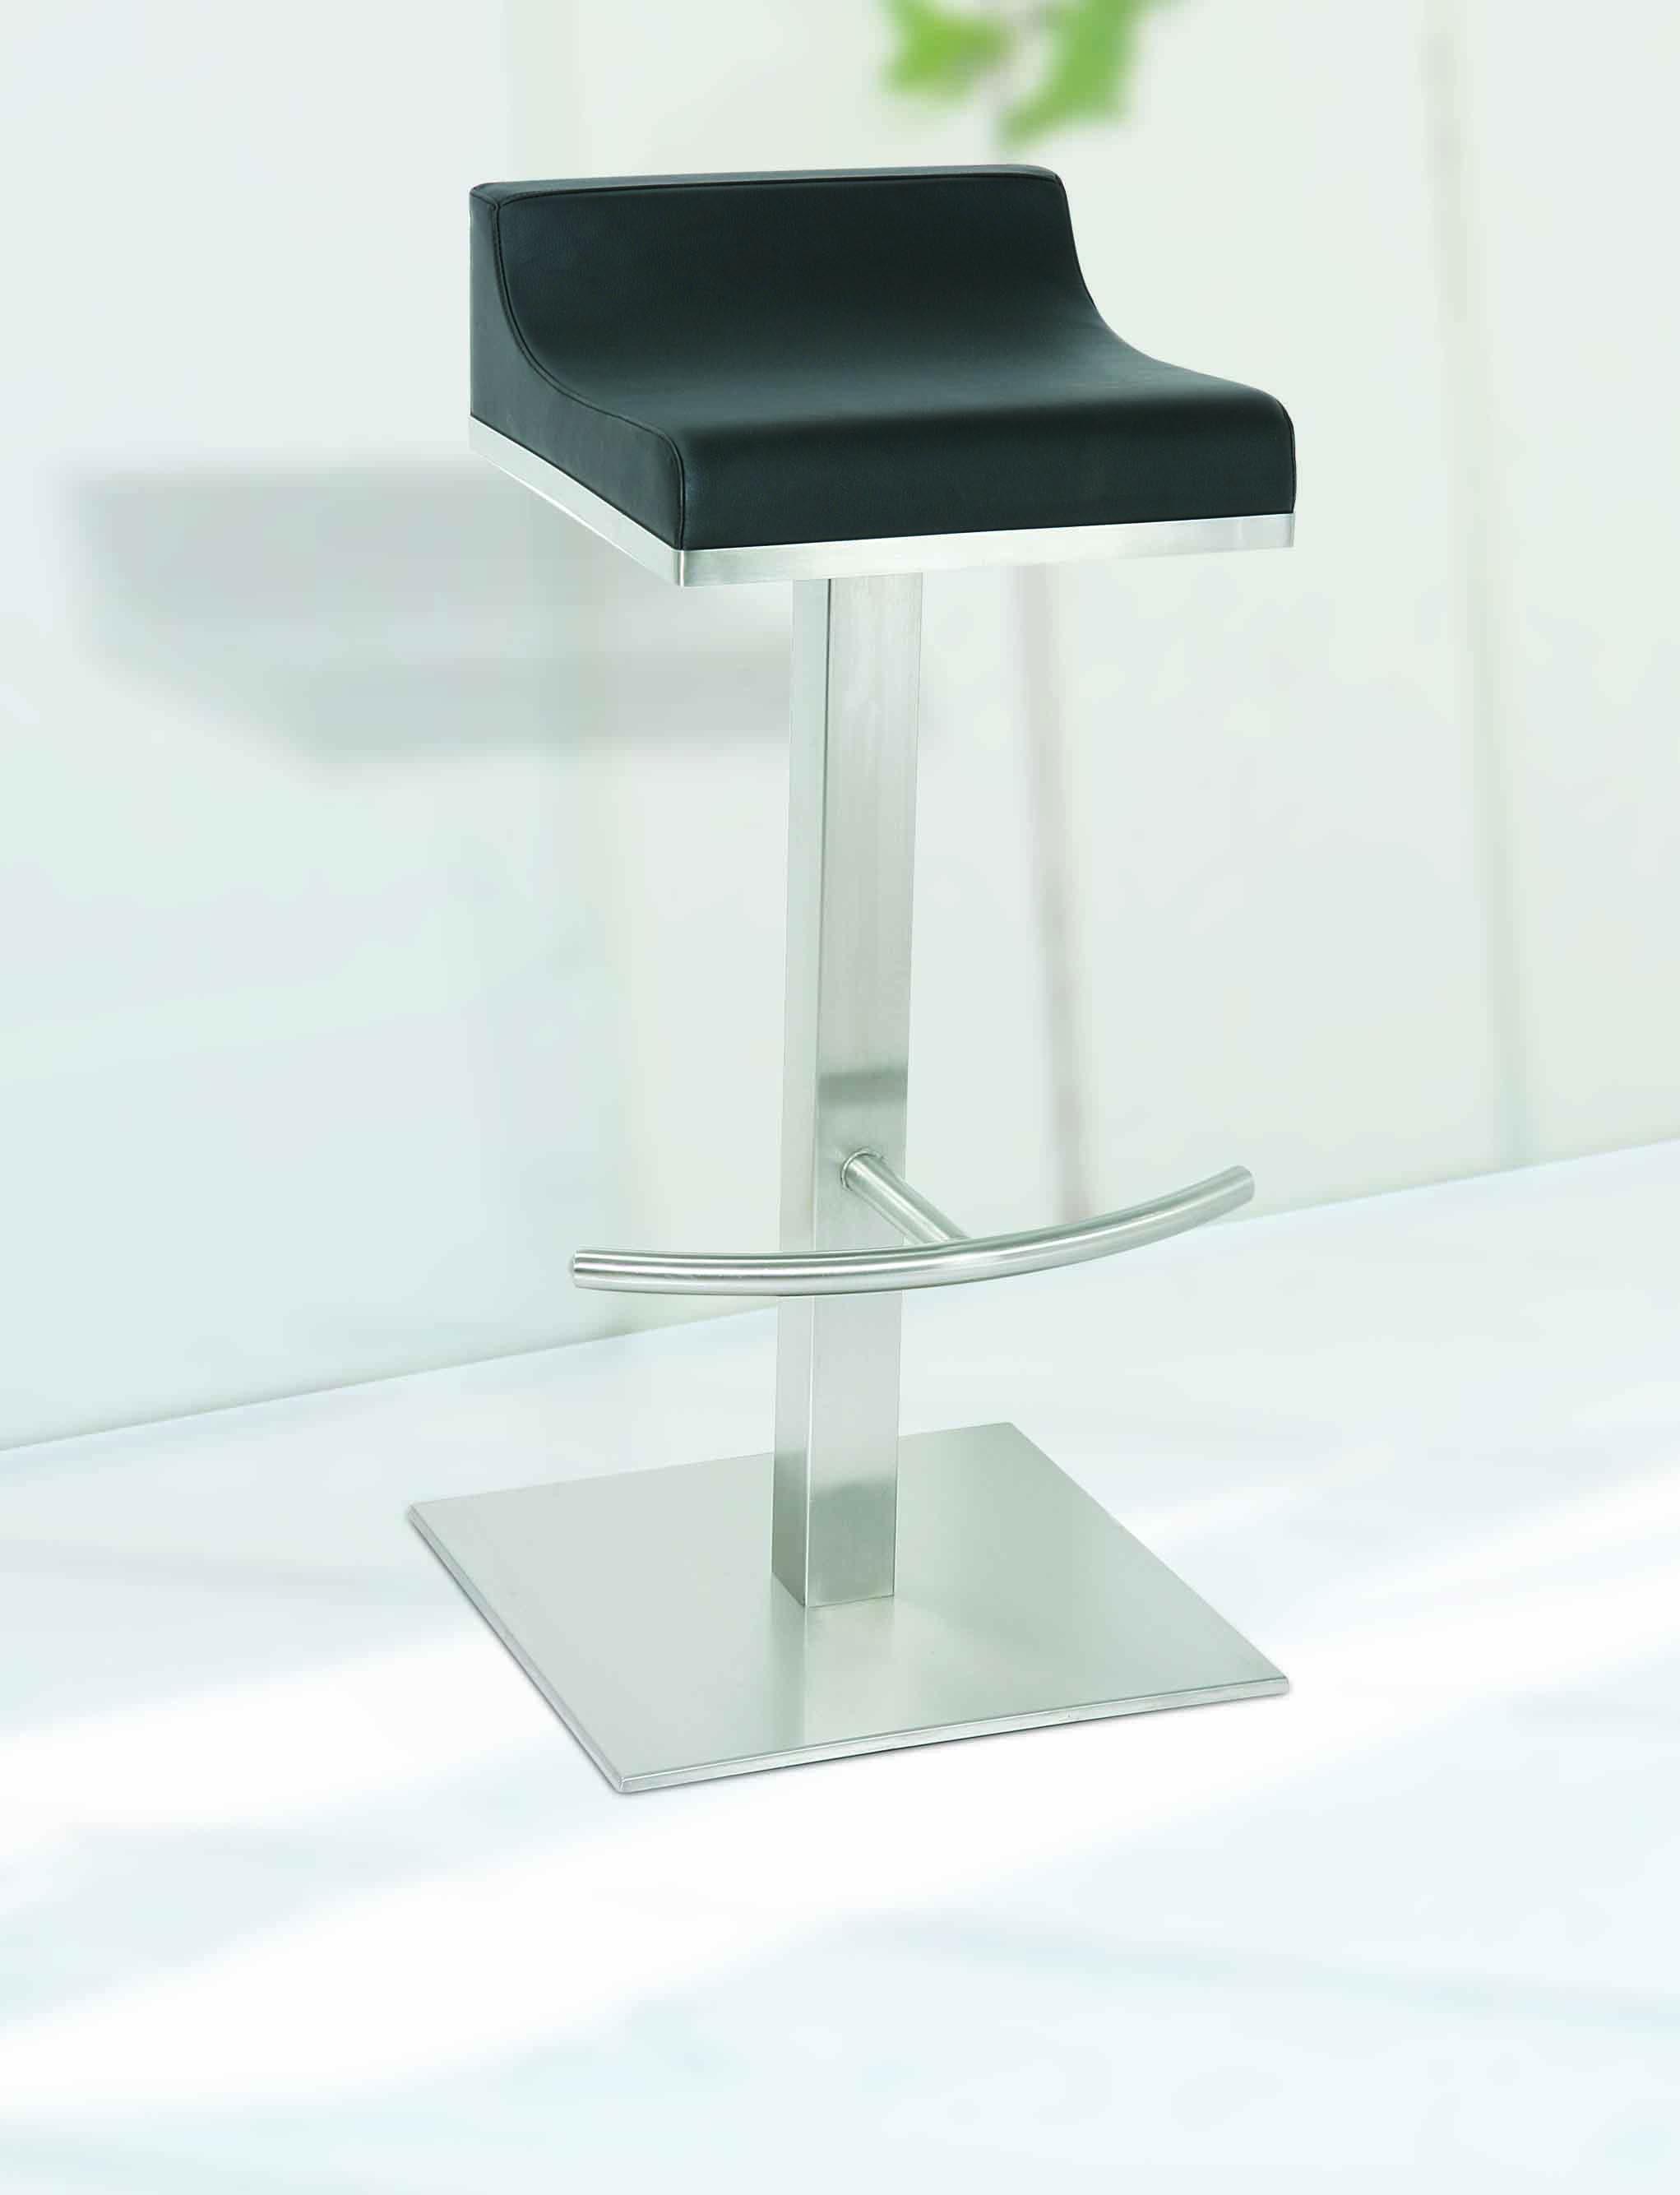 DefySupply Unveils New Line of Contemporary Bar Stools